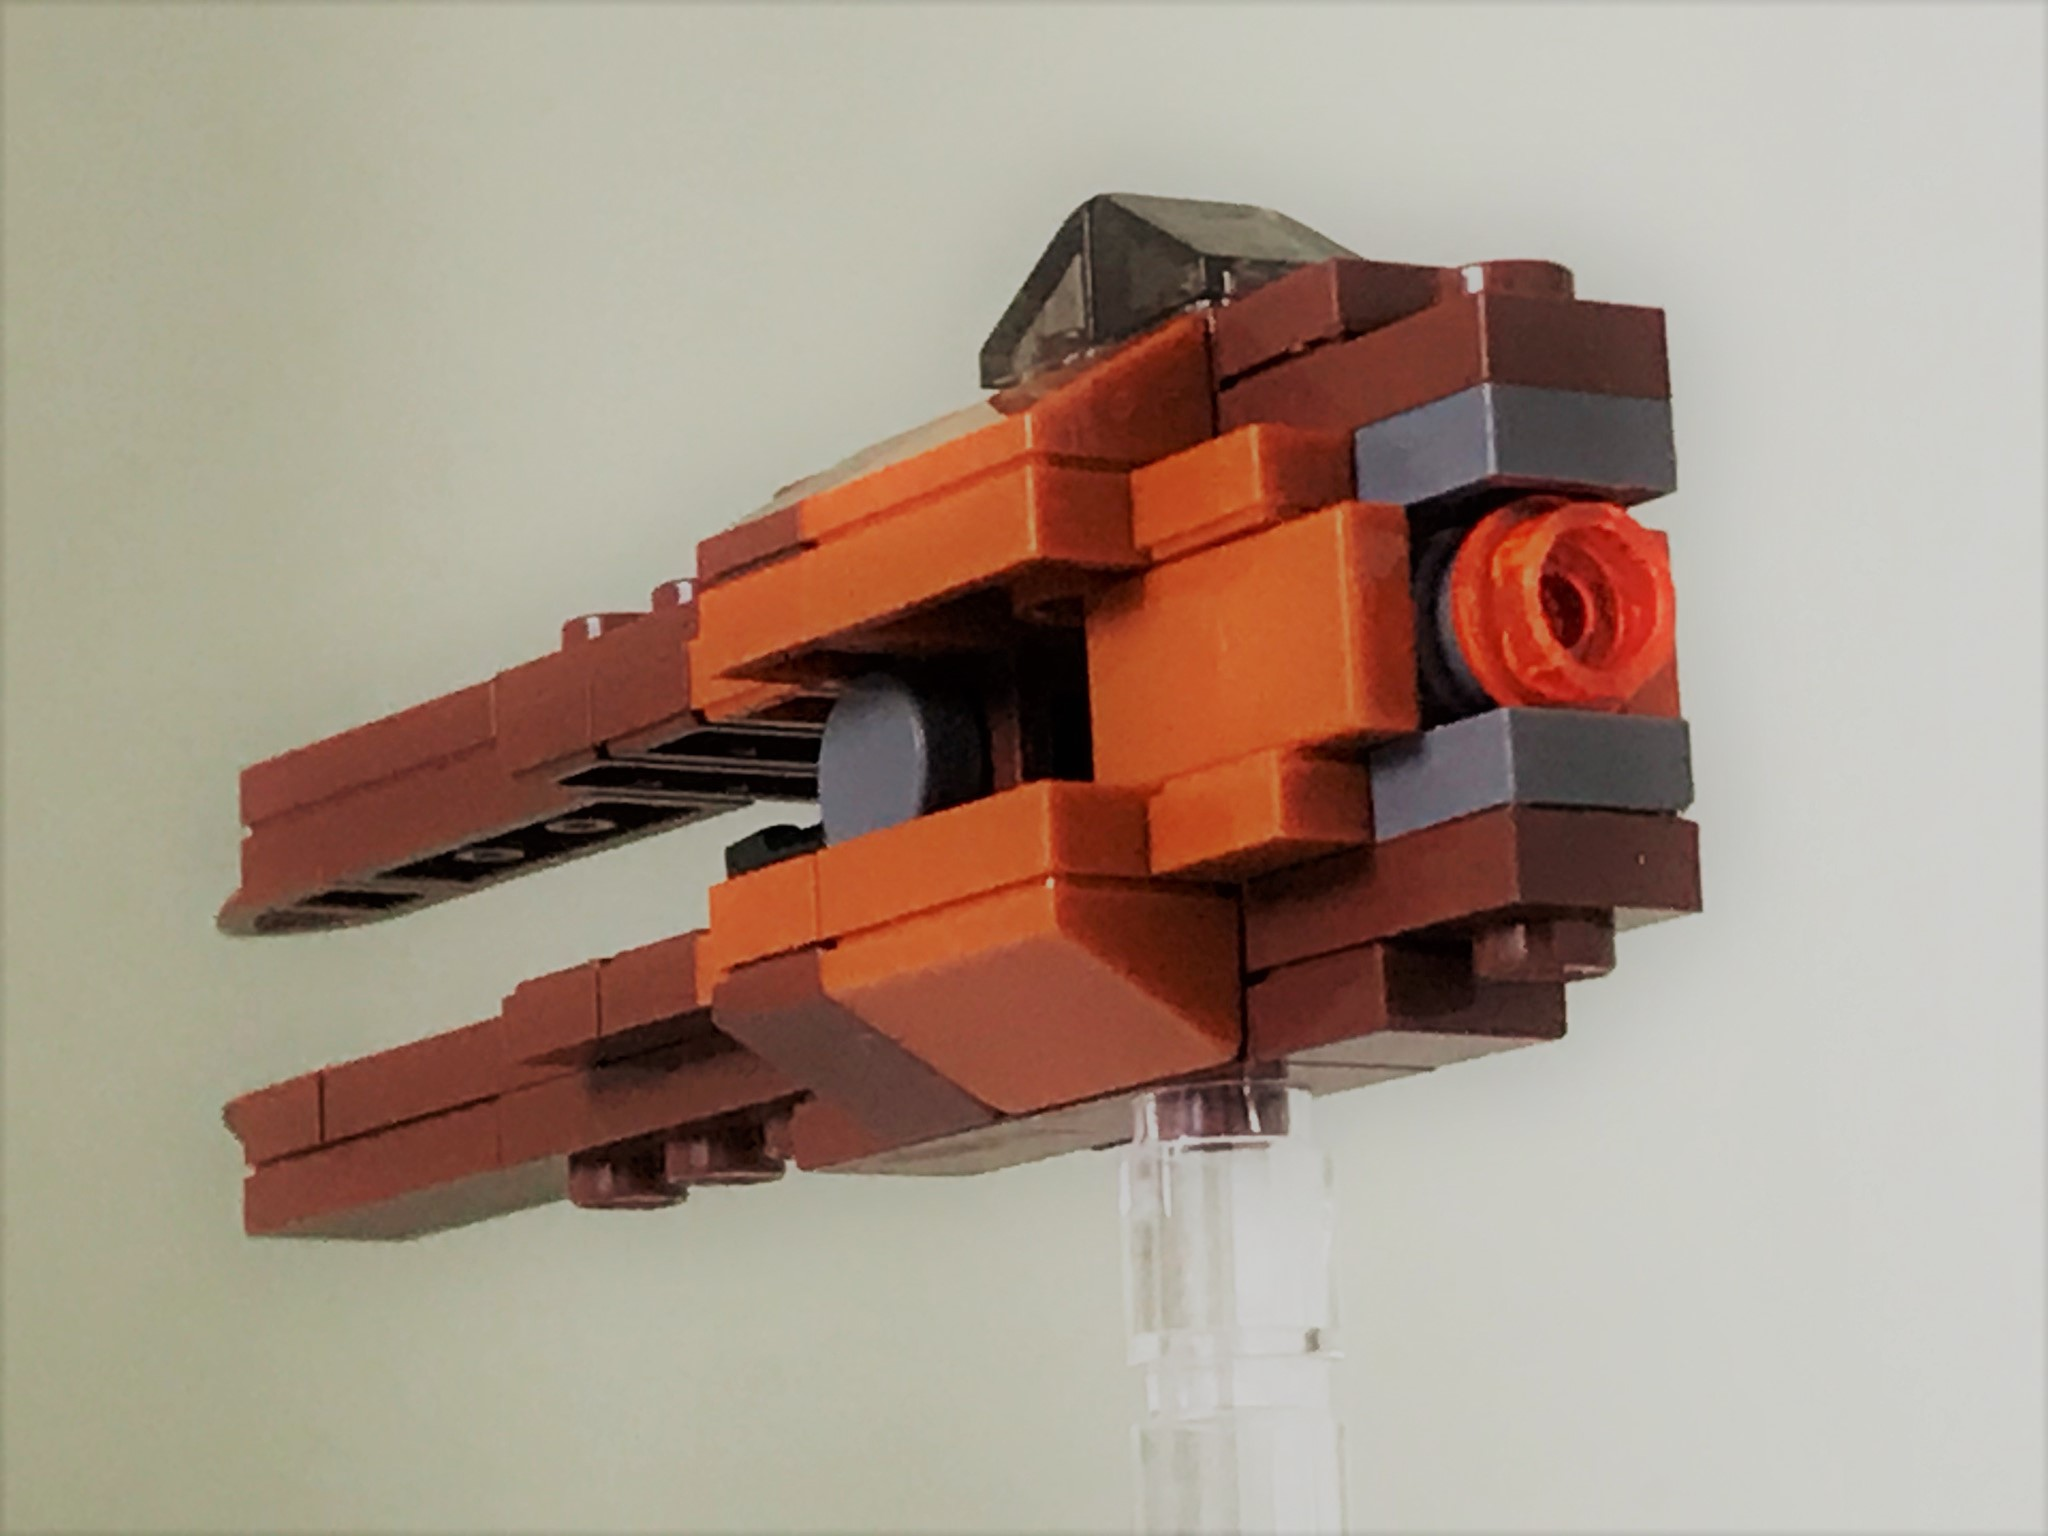 geonosianfighter3.jpeg